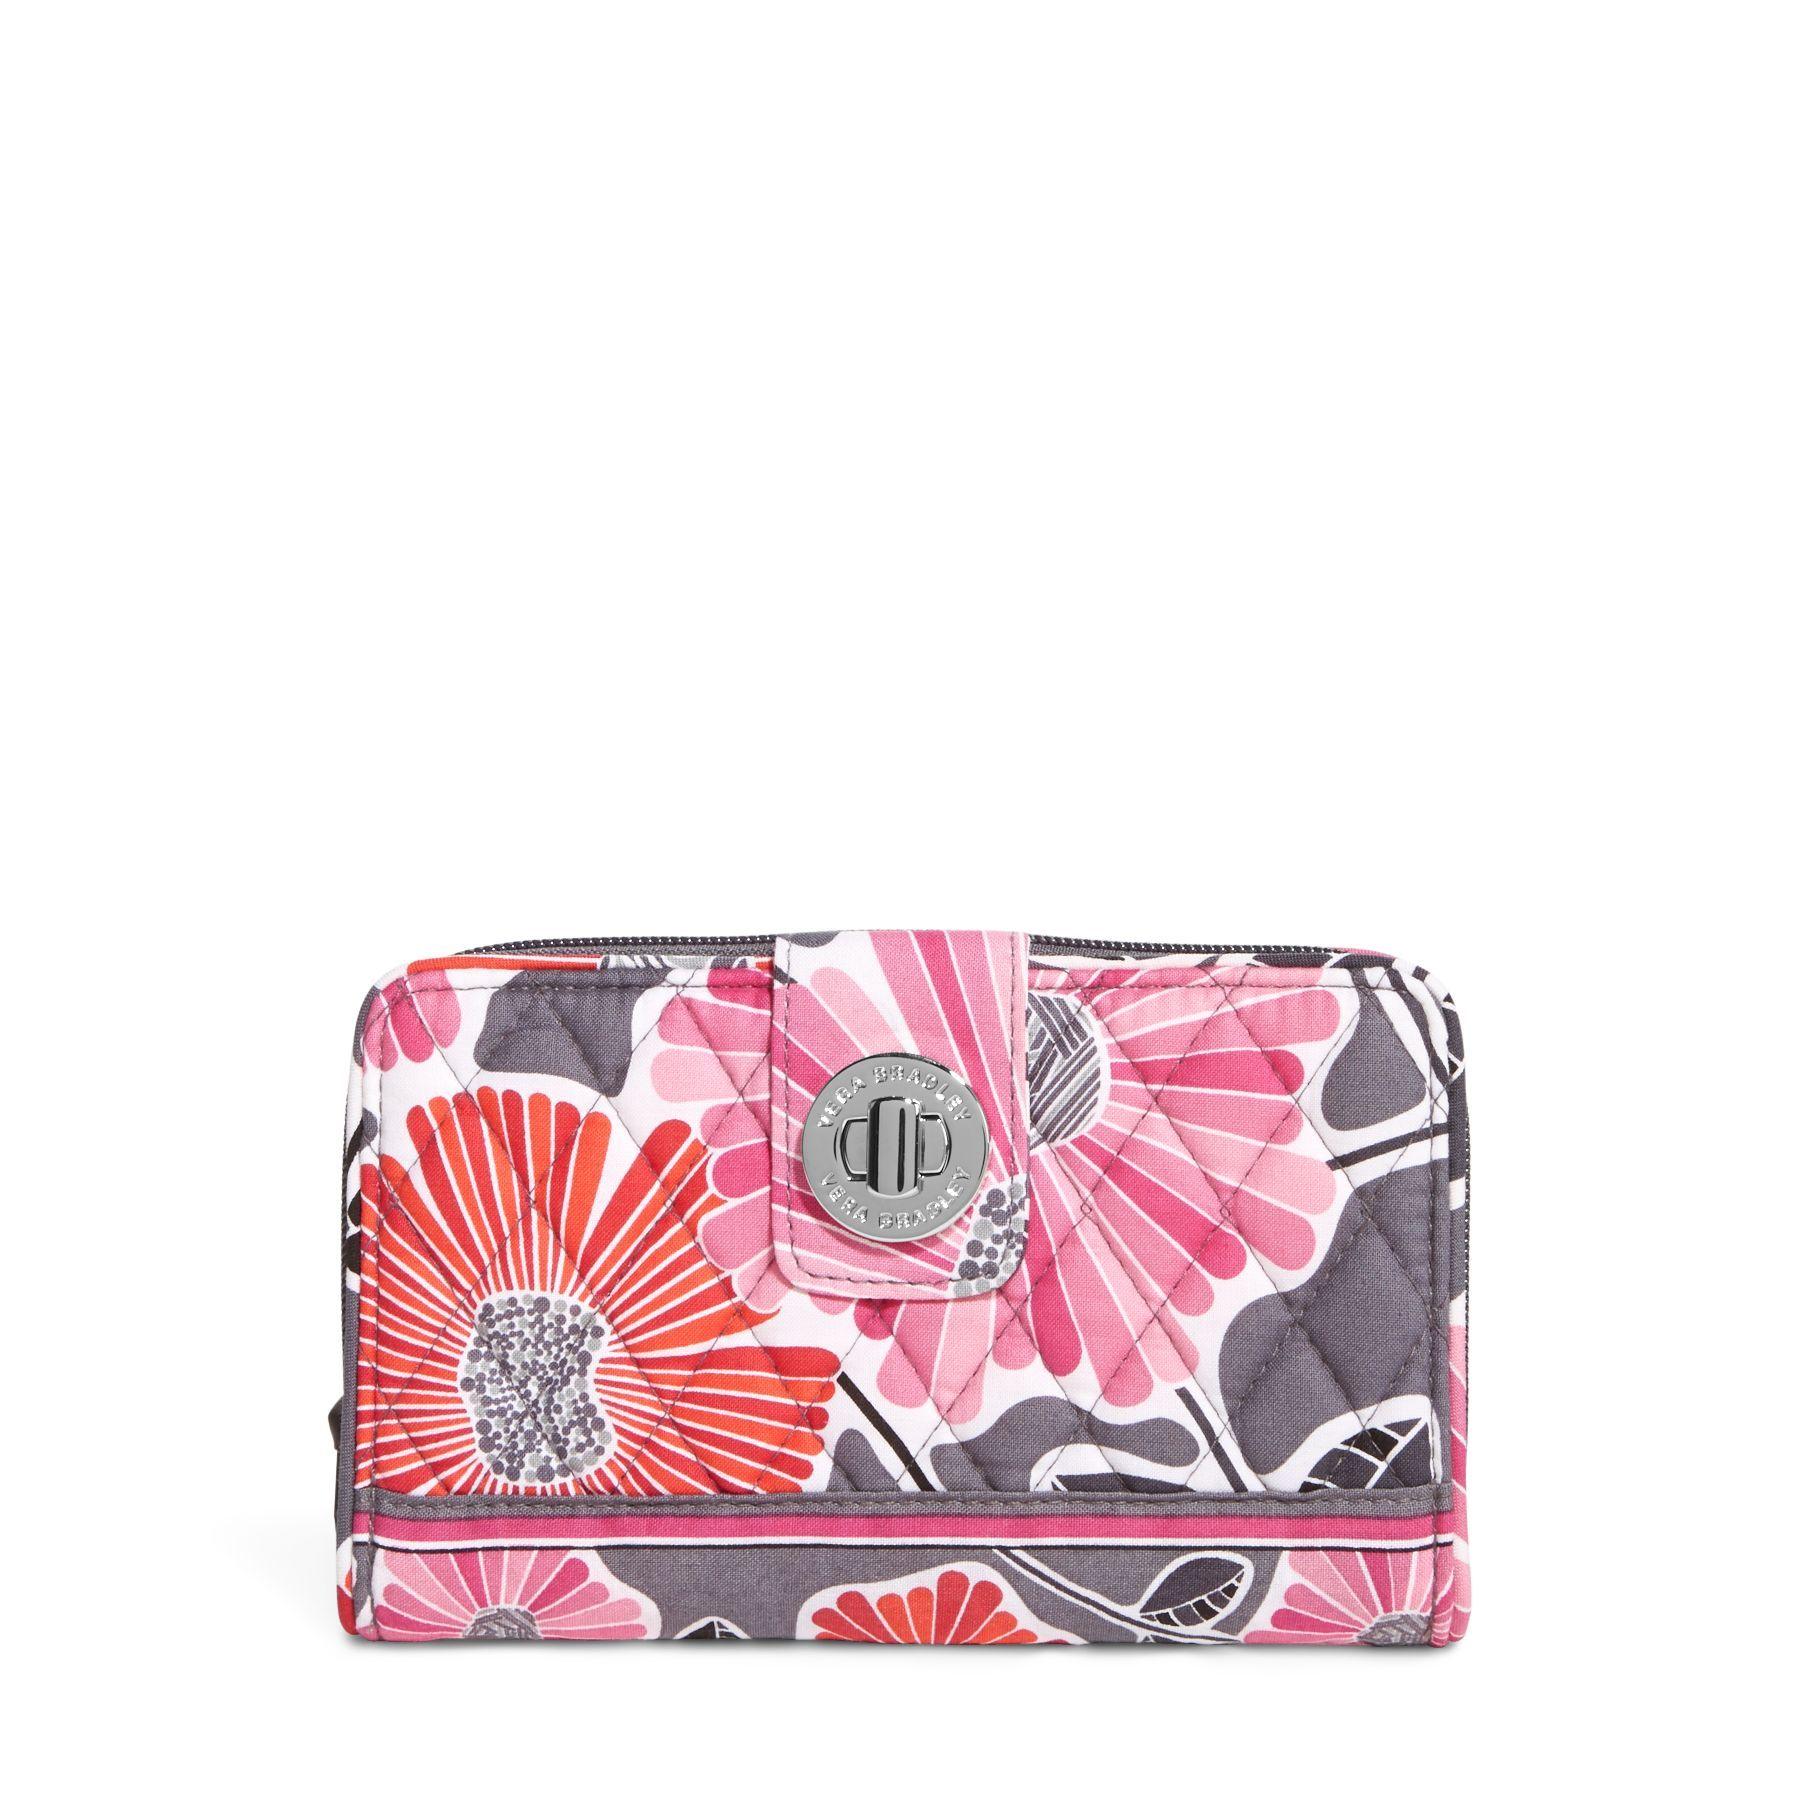 Turn Lock Wallet in Cheery Blossoms, 49 Vera Bradley